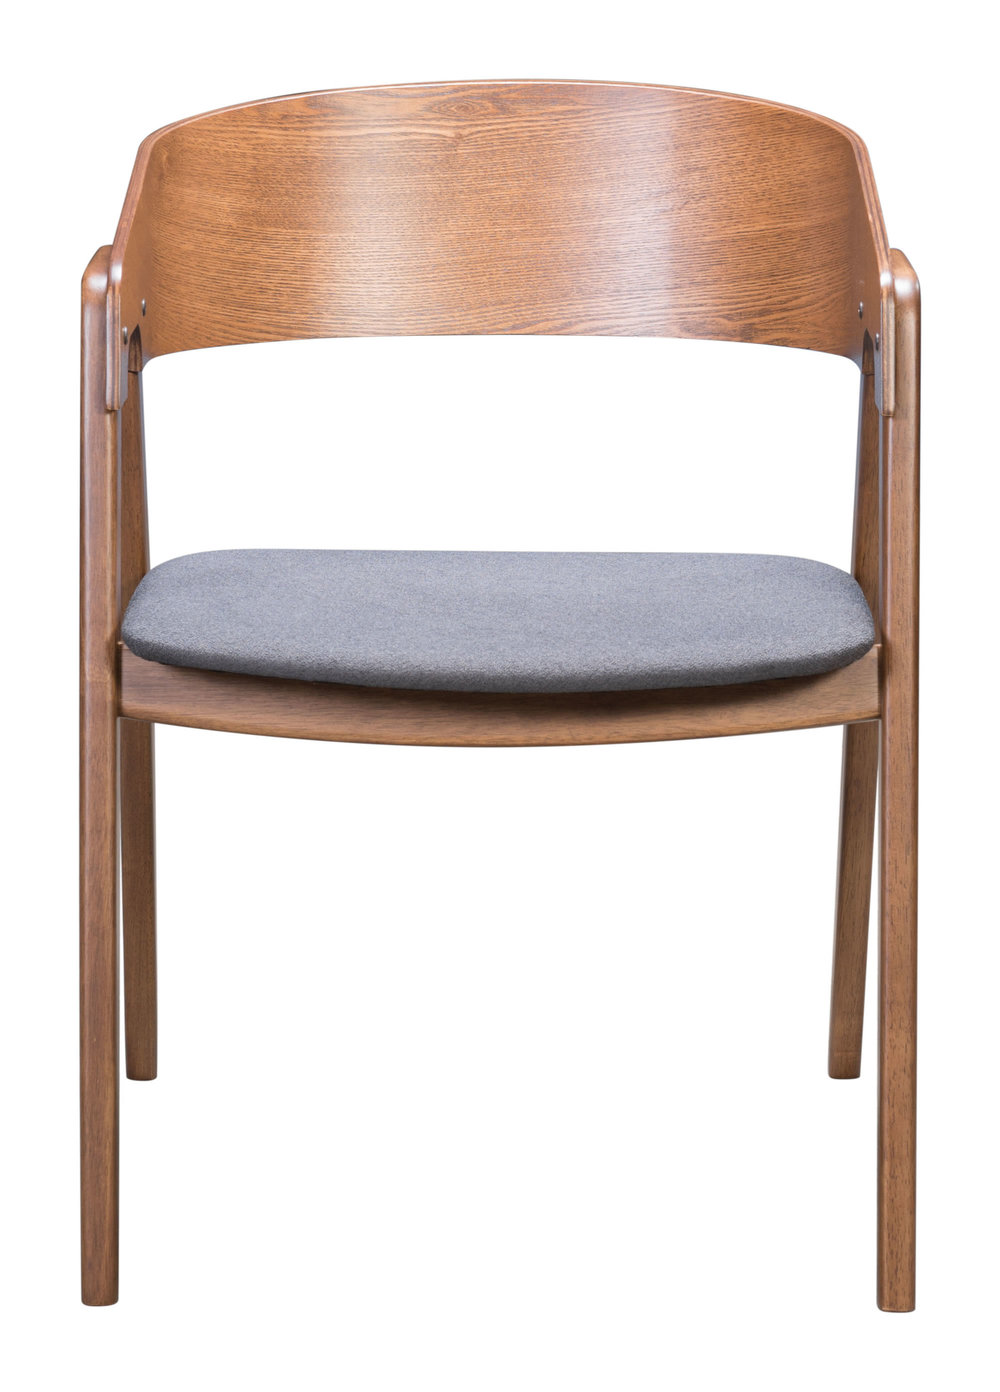 Zuo Modern Contemporary - Alden Dining Arm Chair - Set of 2 - Walnut & Dark Gray